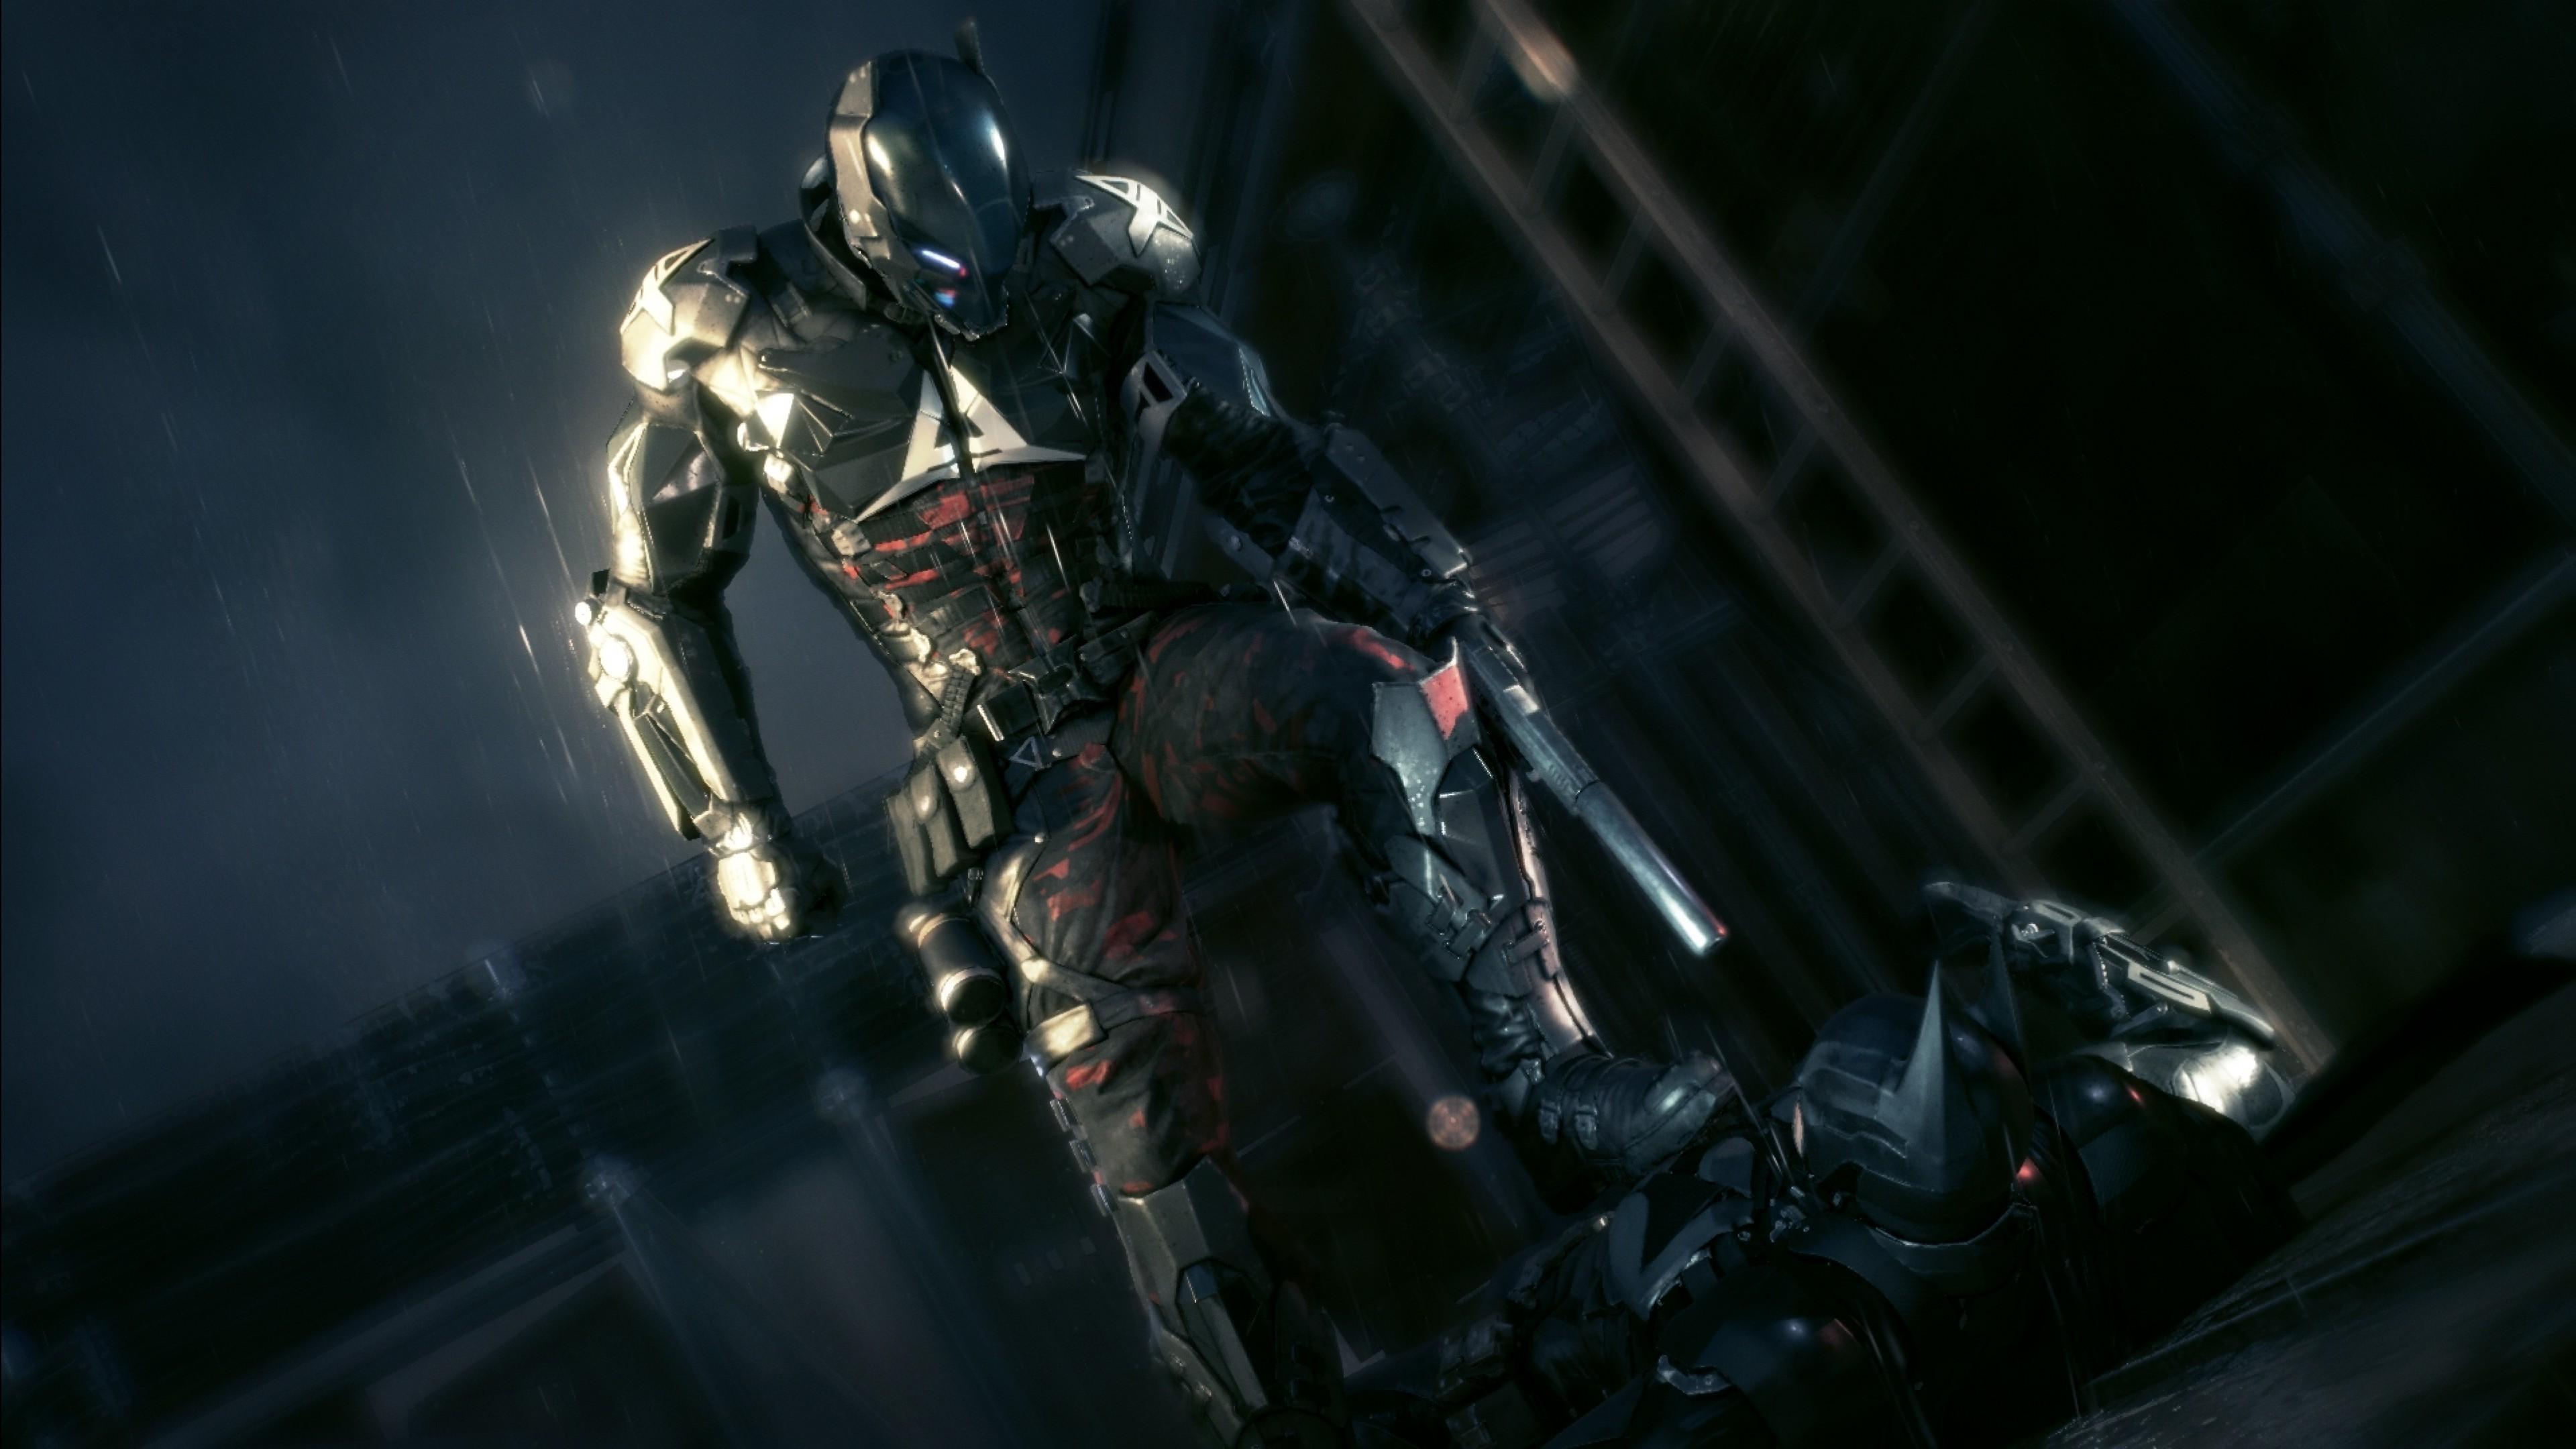 Batman: Arkham Knight, Rocksteady Studios, Batman, Gotham City, Video Games  Wallpapers HD / Desktop and Mobile Backgrounds